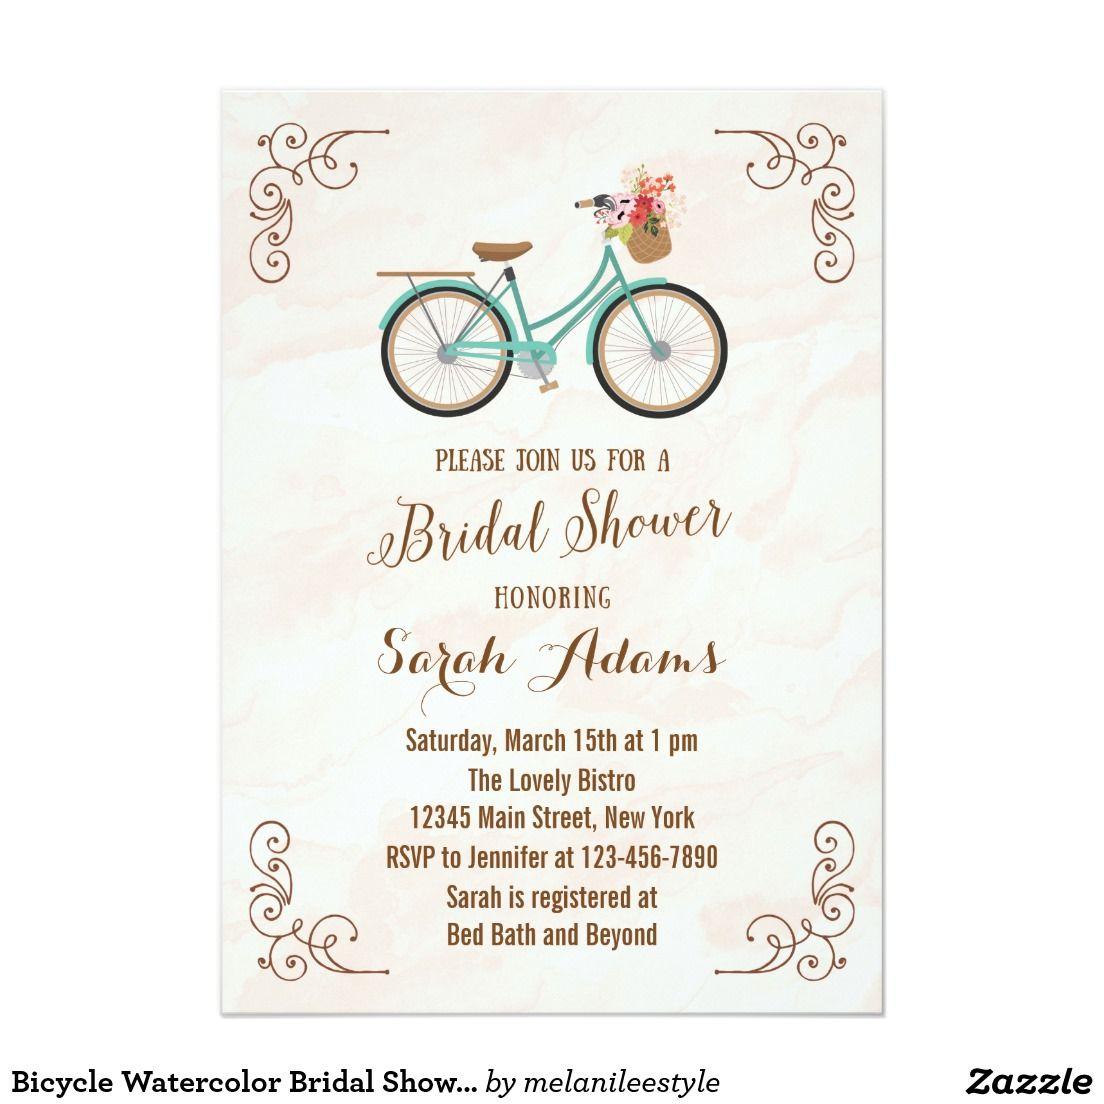 Bicycle watercolor bridal shower invitation shower invitations bicycle watercolor bridal shower invitation filmwisefo Choice Image